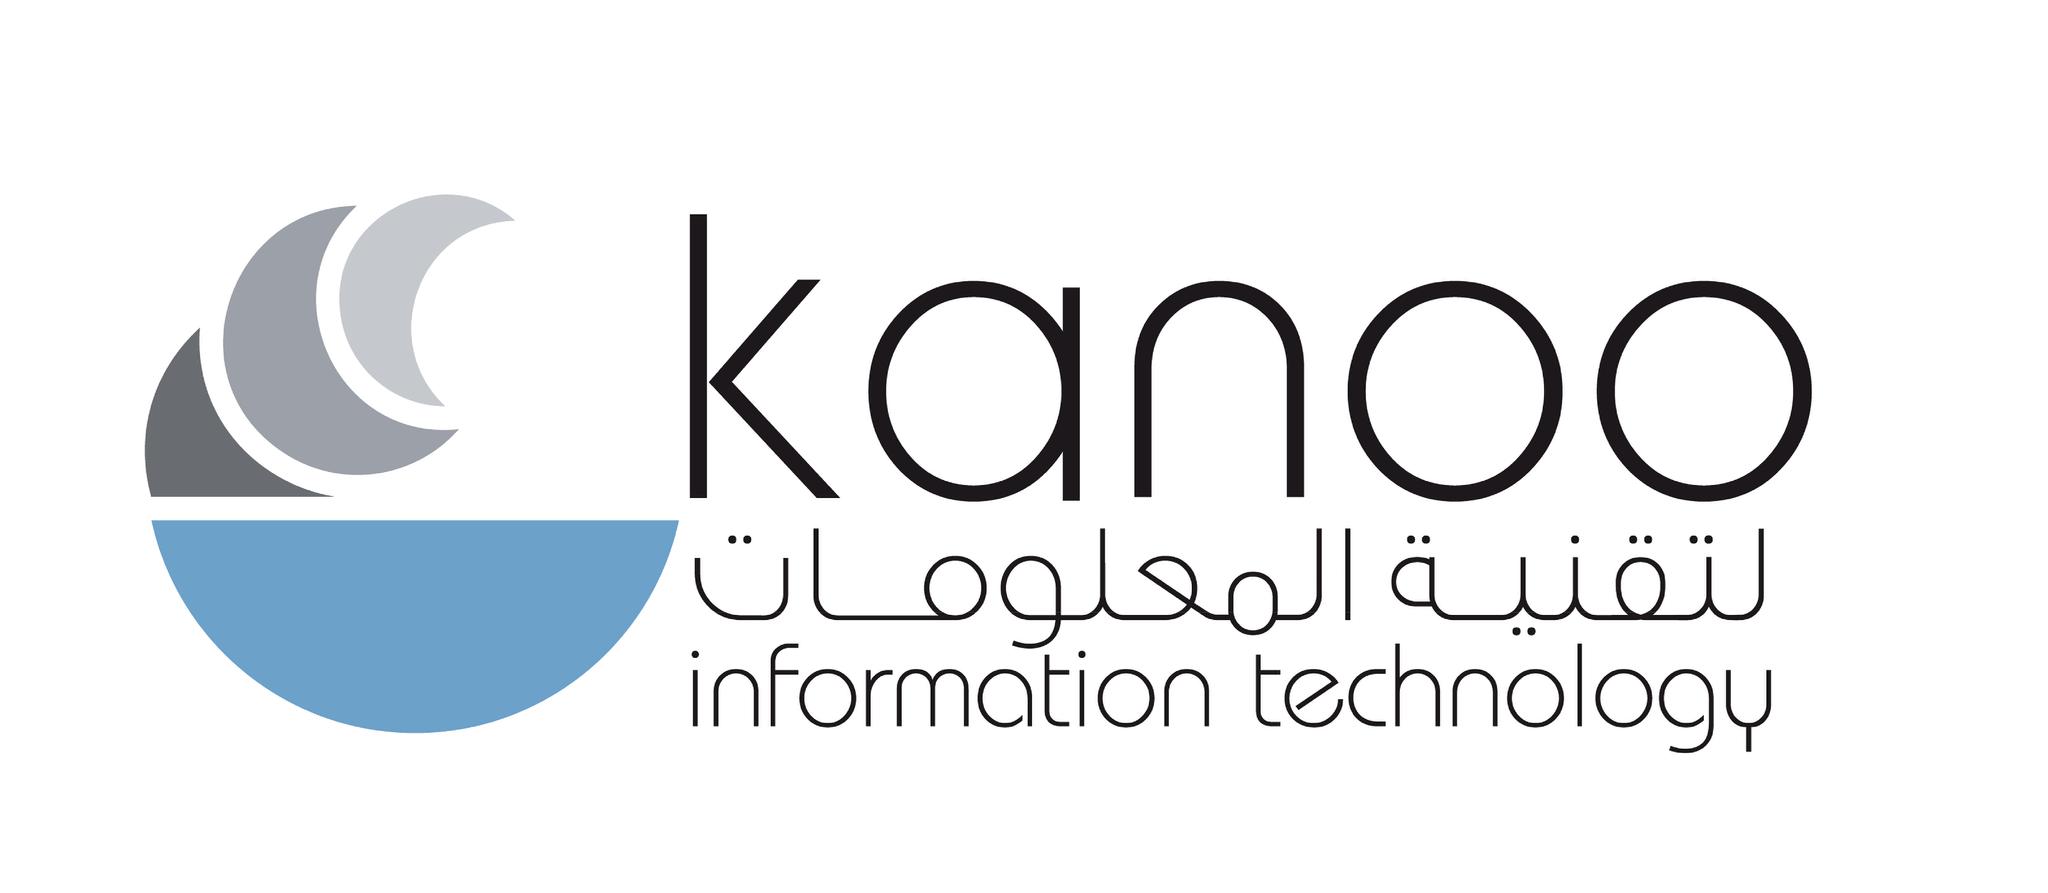 Kanoo Information Technology